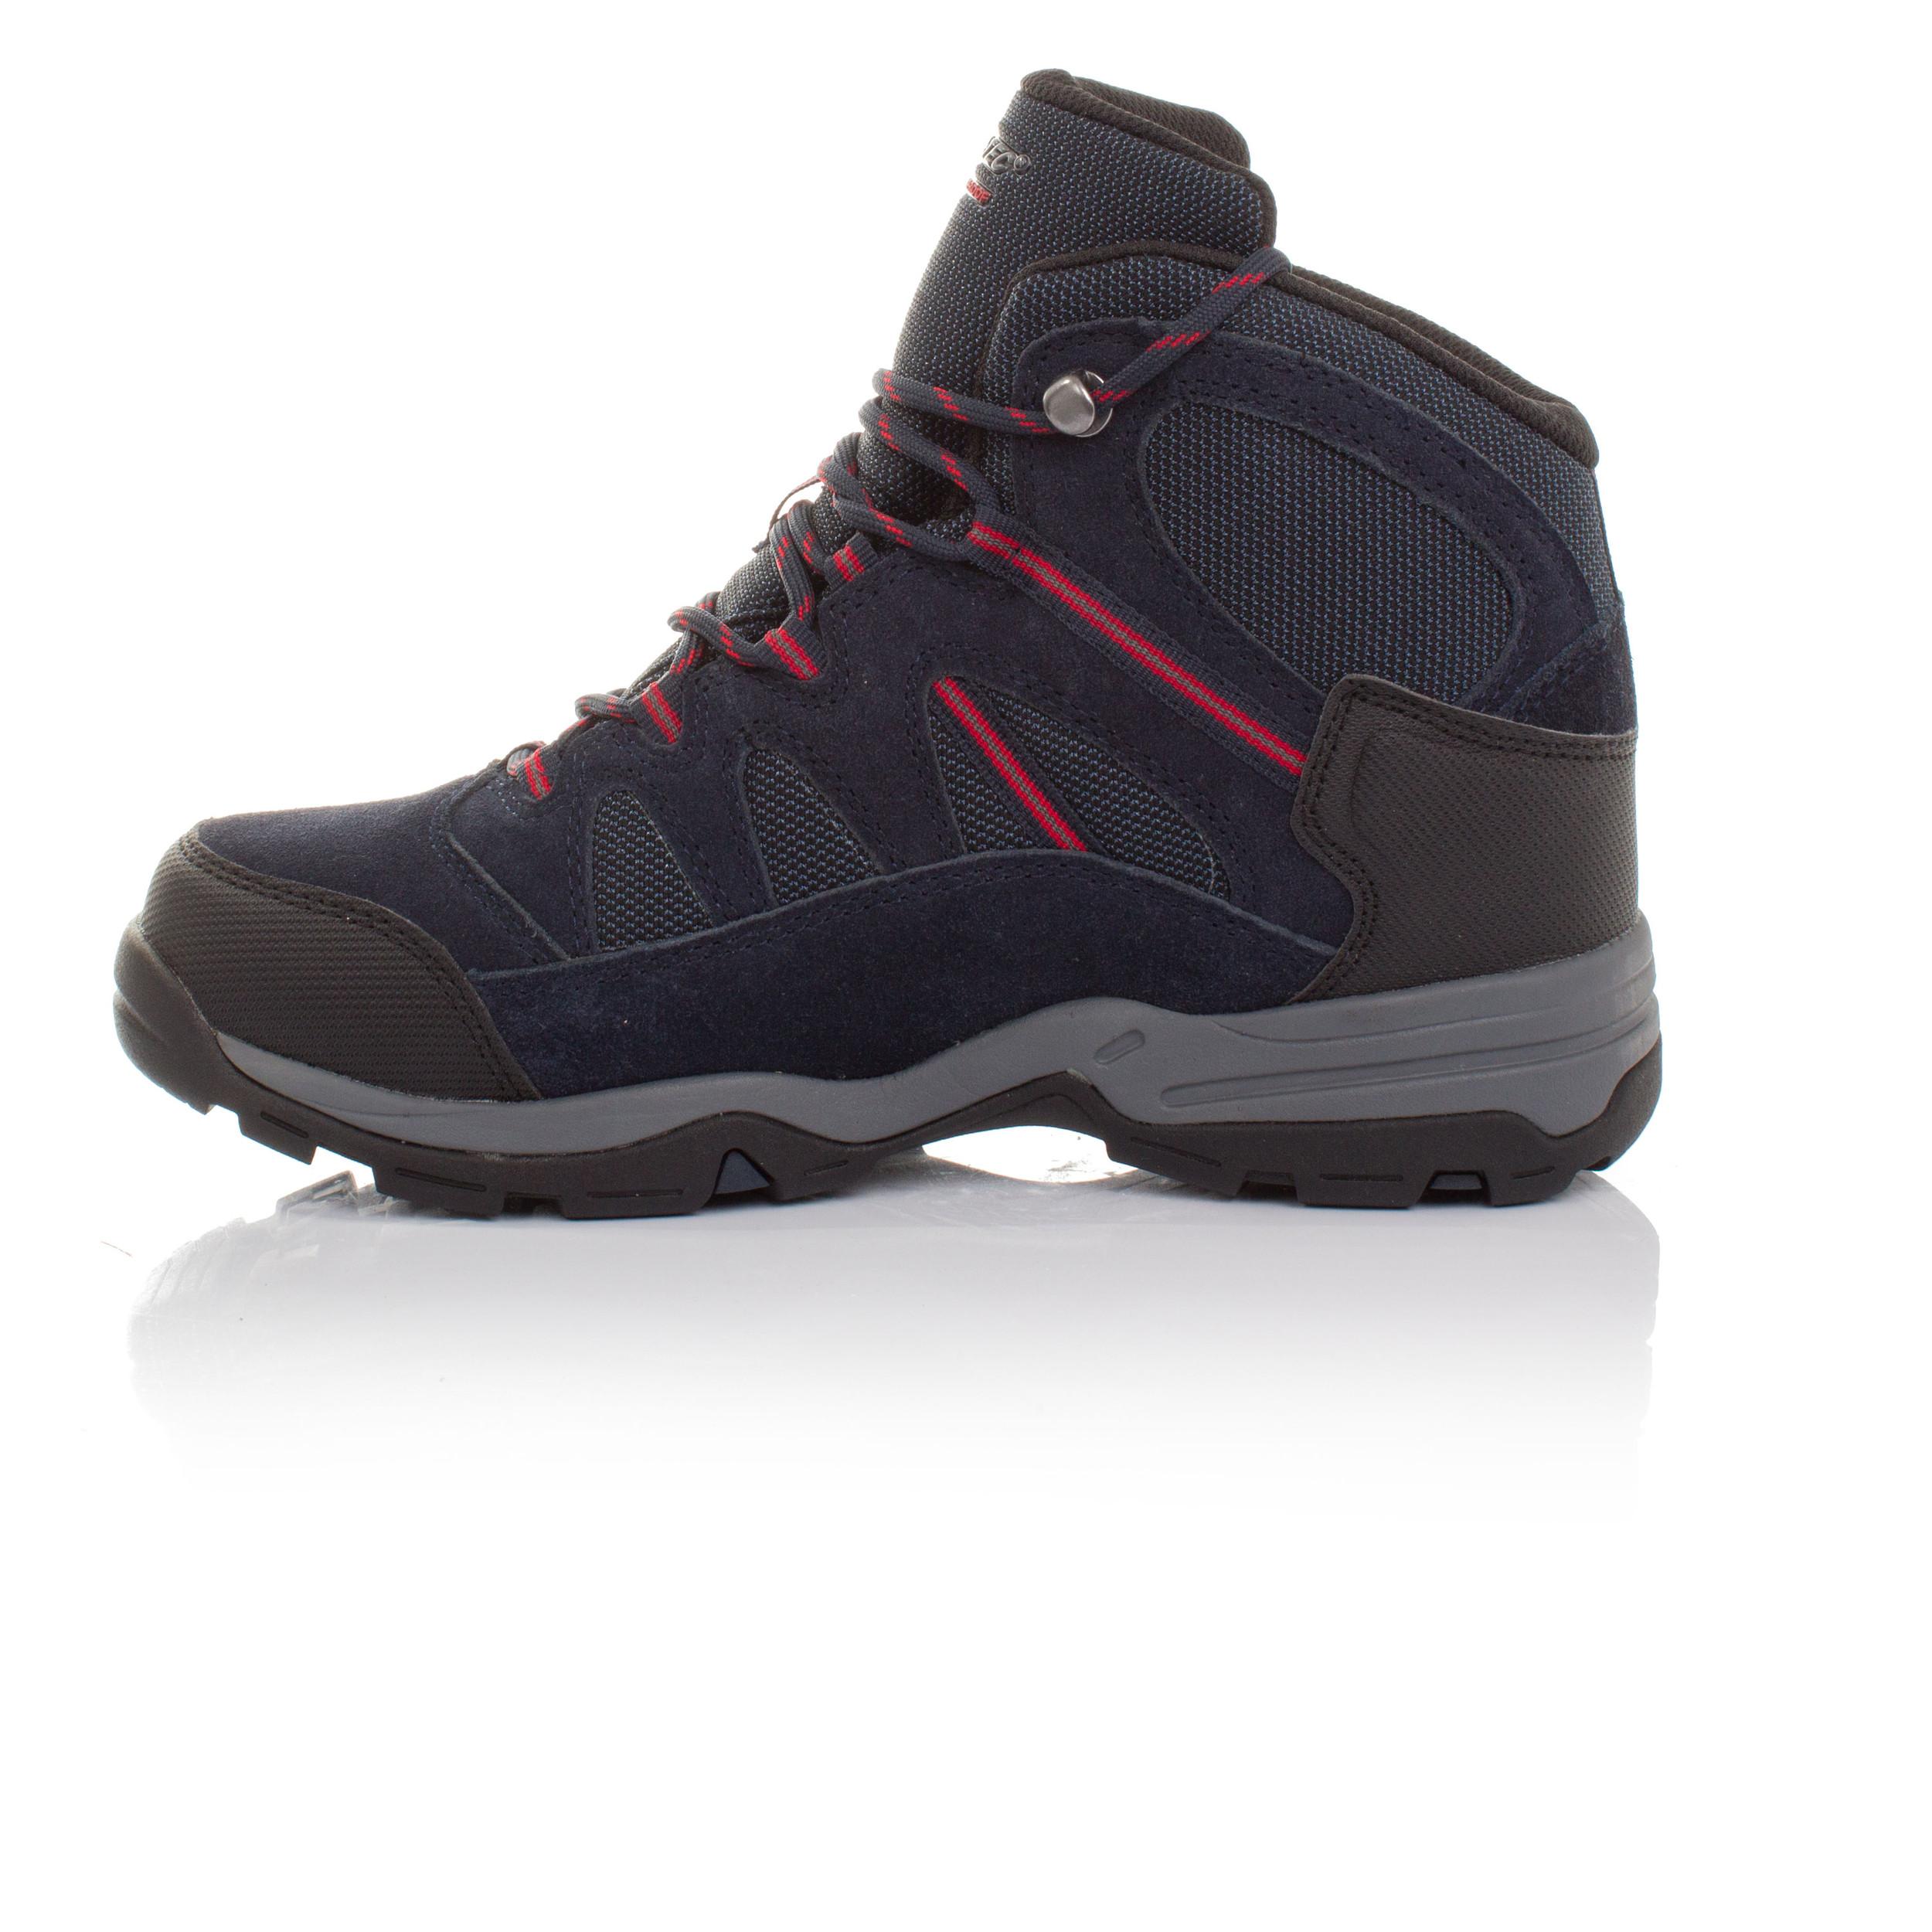 Hi-Tec-Bandera-II-Mid-WP-Hombre-Azul-Impermeable-Camino-Hiking-Botas-Zapatos